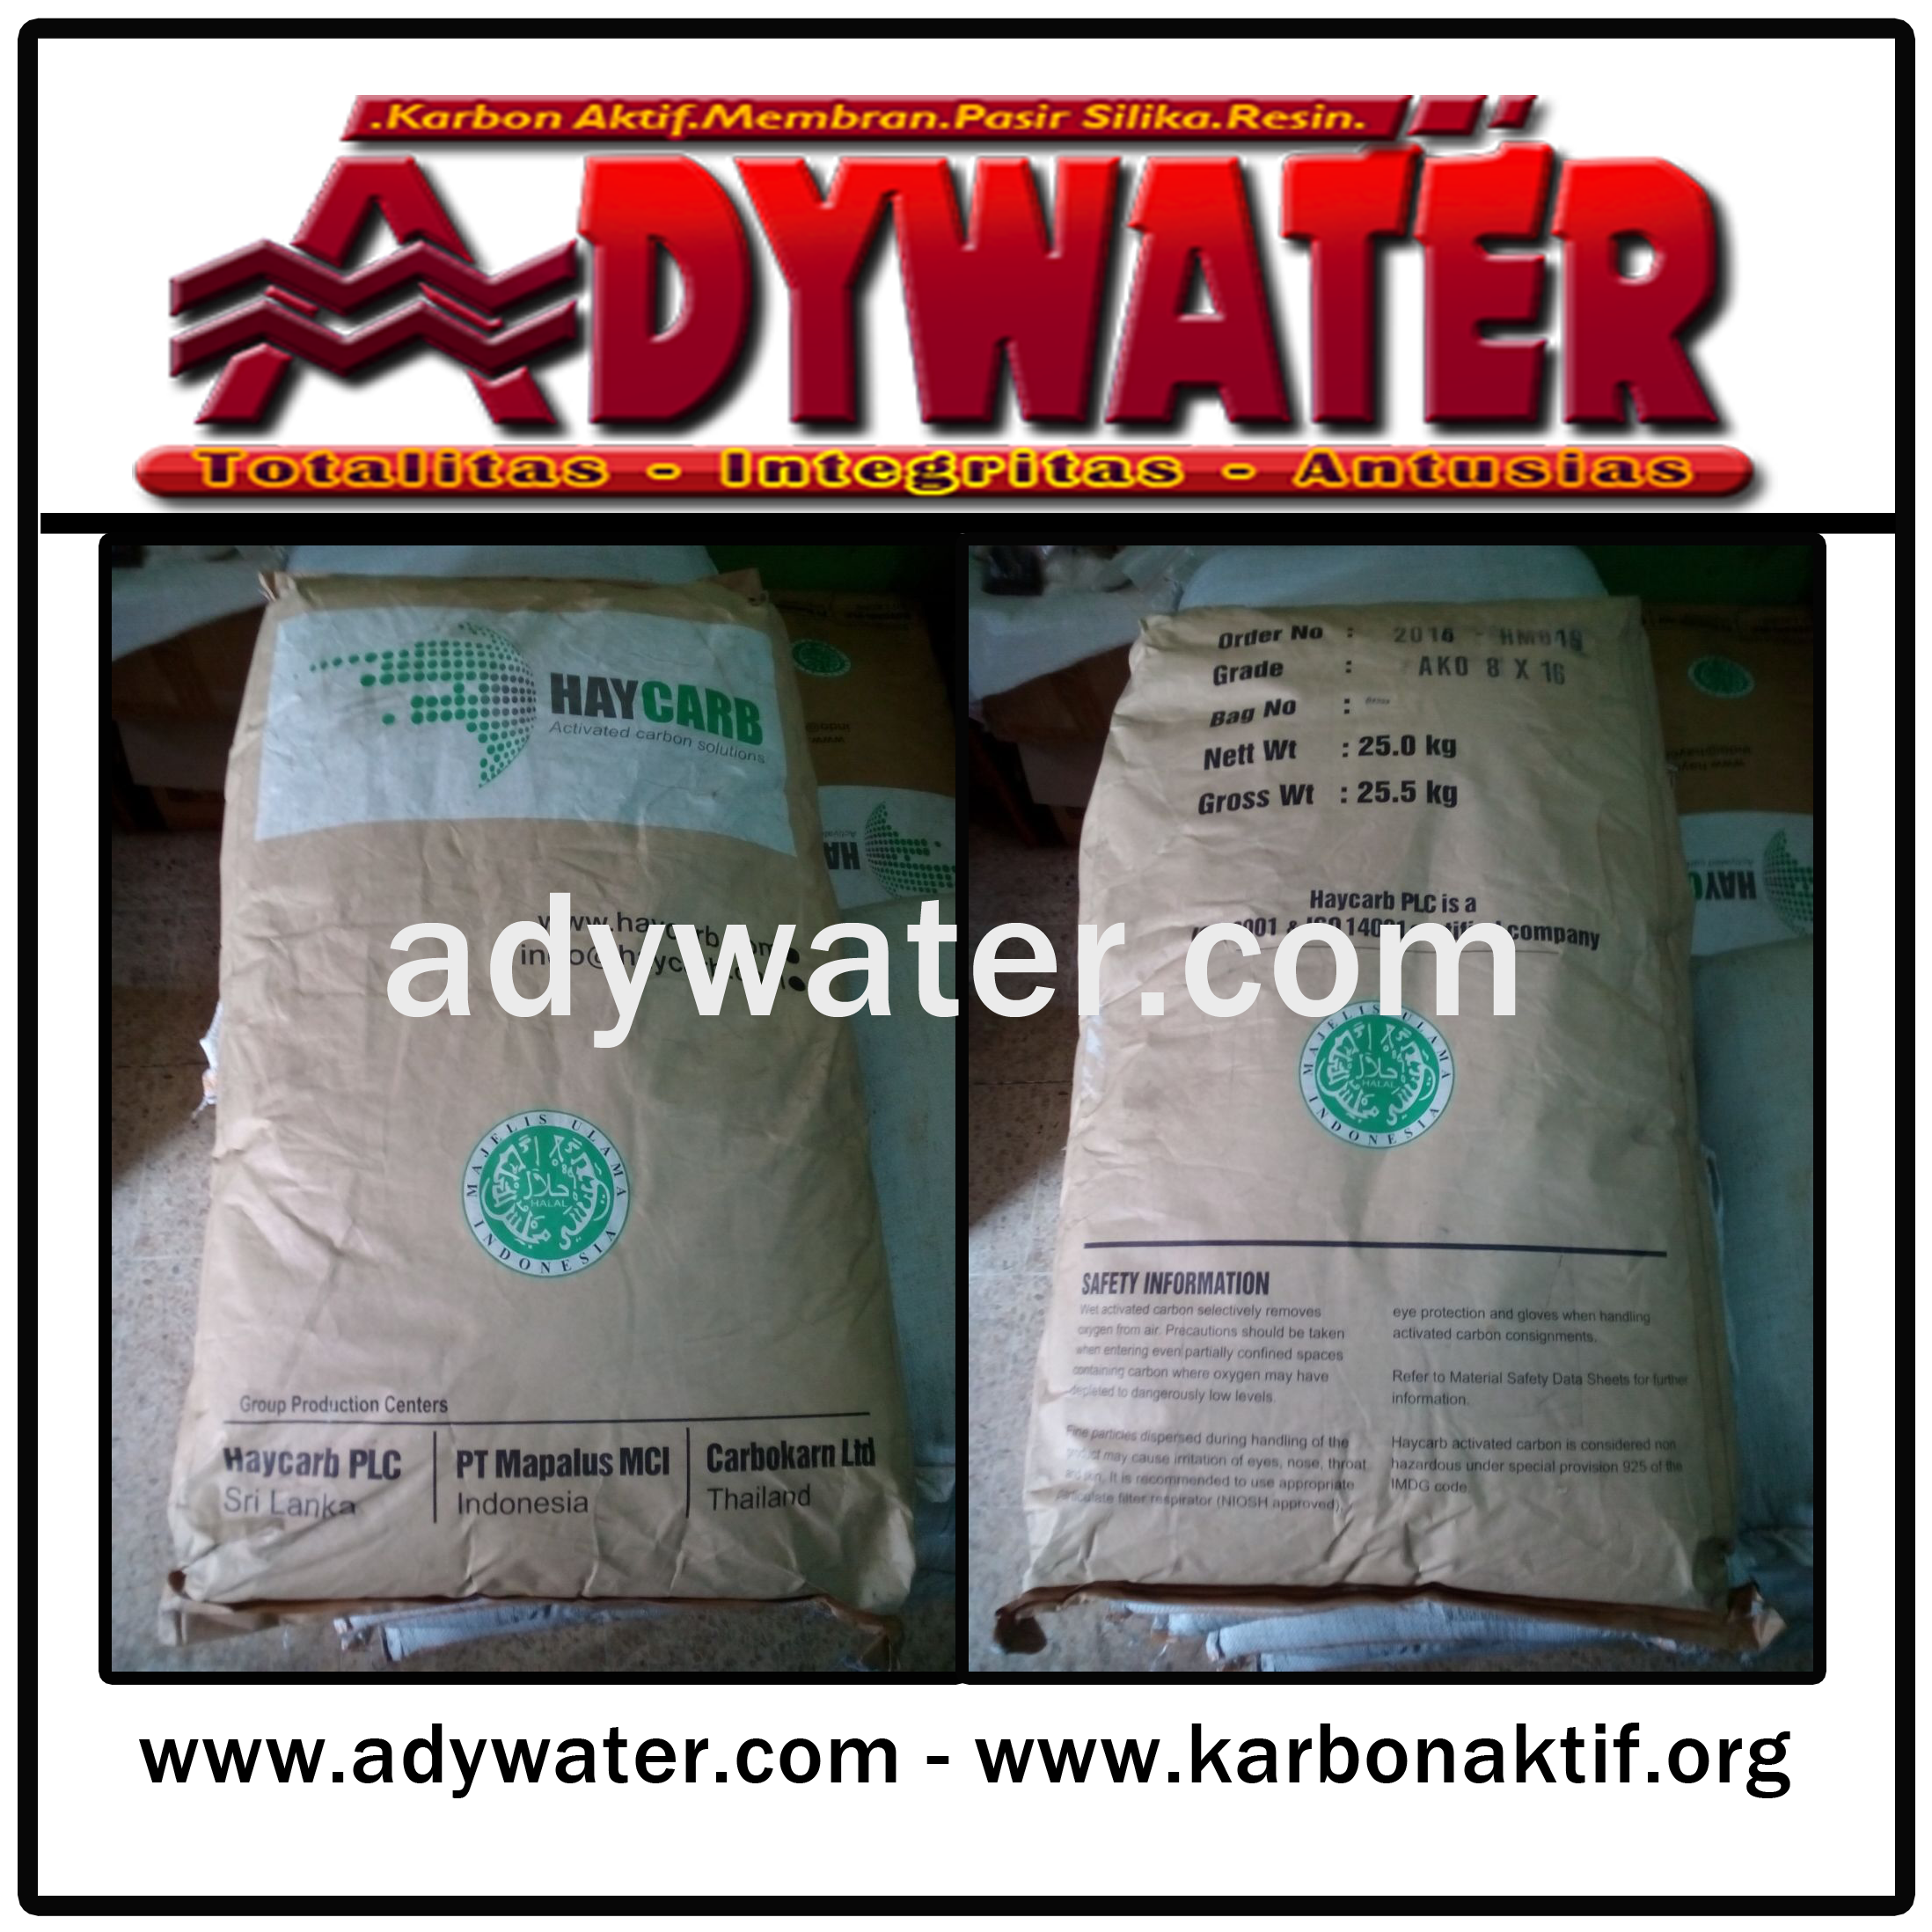 PABRIK KARBON AKTIF DI JAKARTA| 0821 2742 4060 | 0821 2742 3050 | SUPLIER KARBON AKTIF DI JAKARTA | ADY WATER